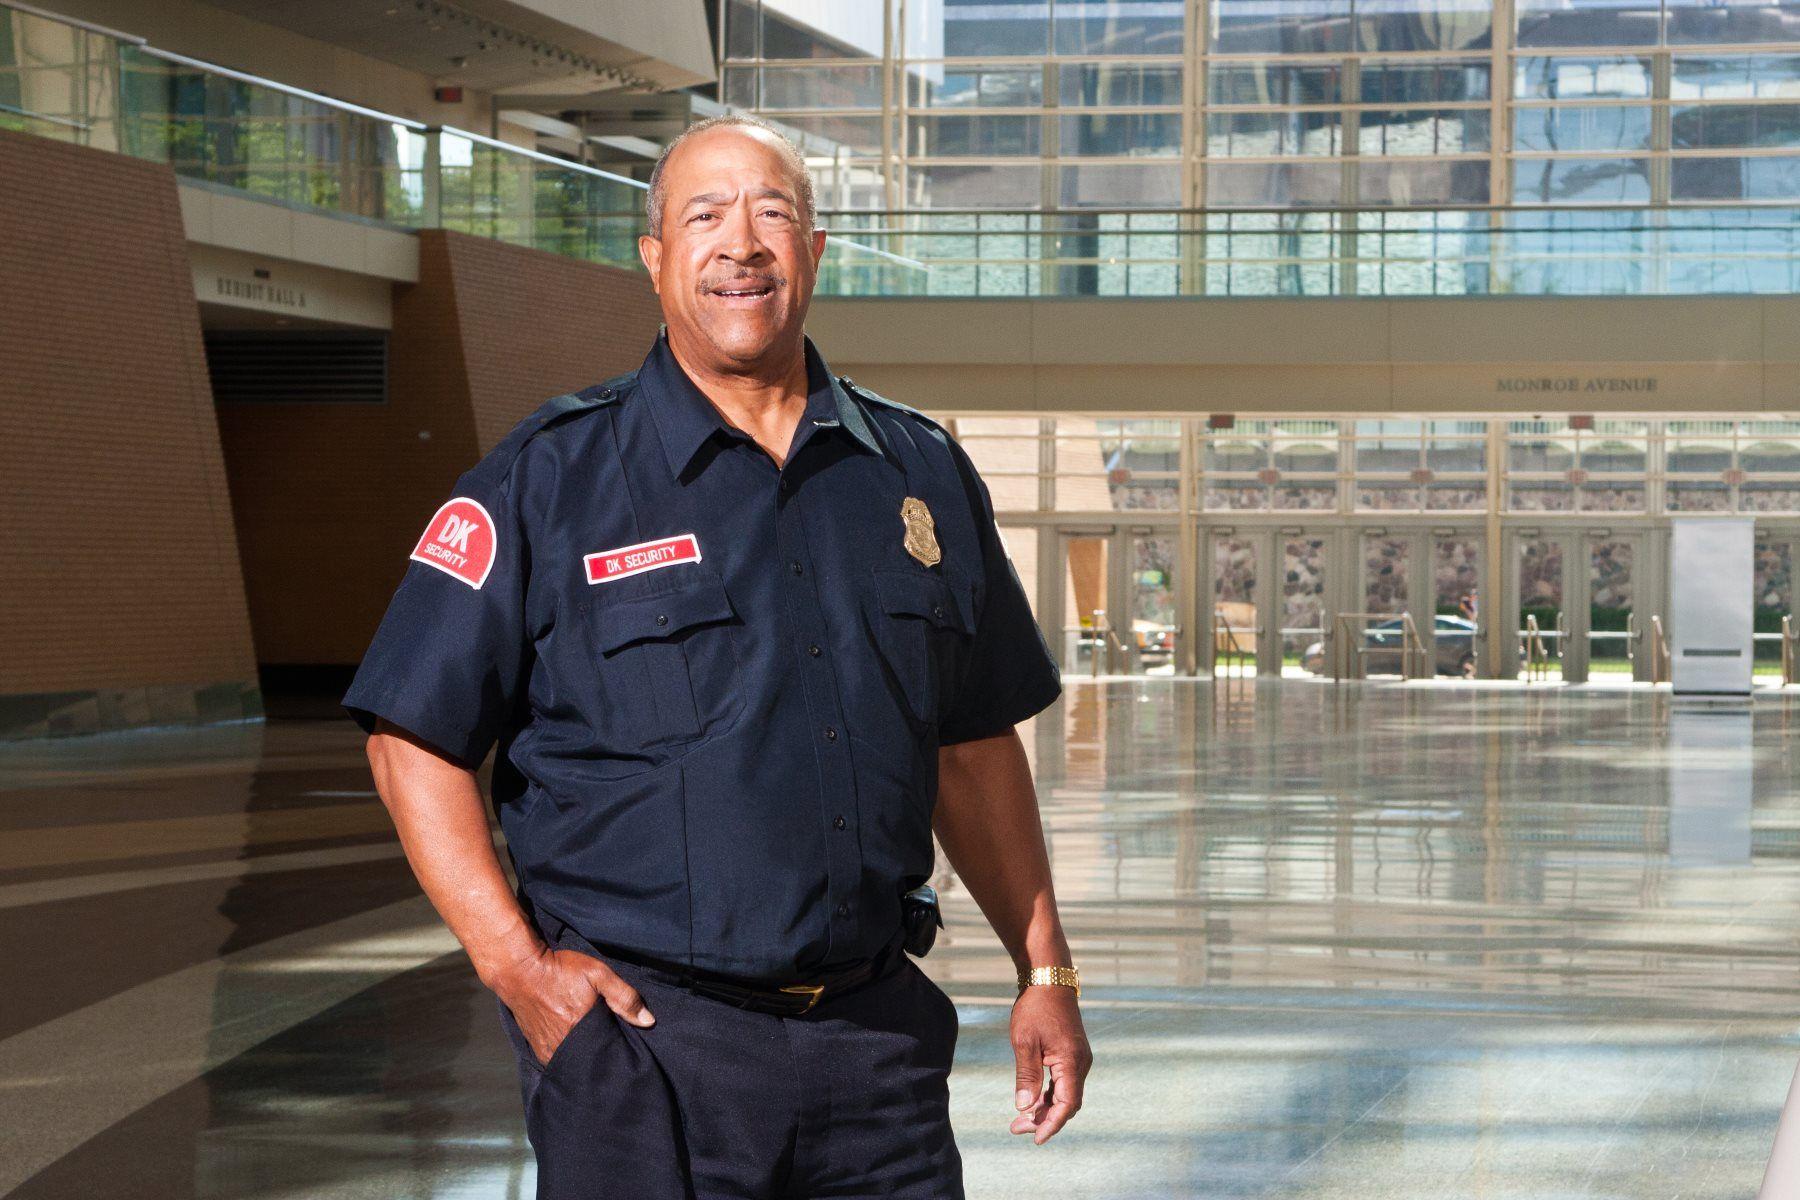 4 benefits of professional security uniforms best buy